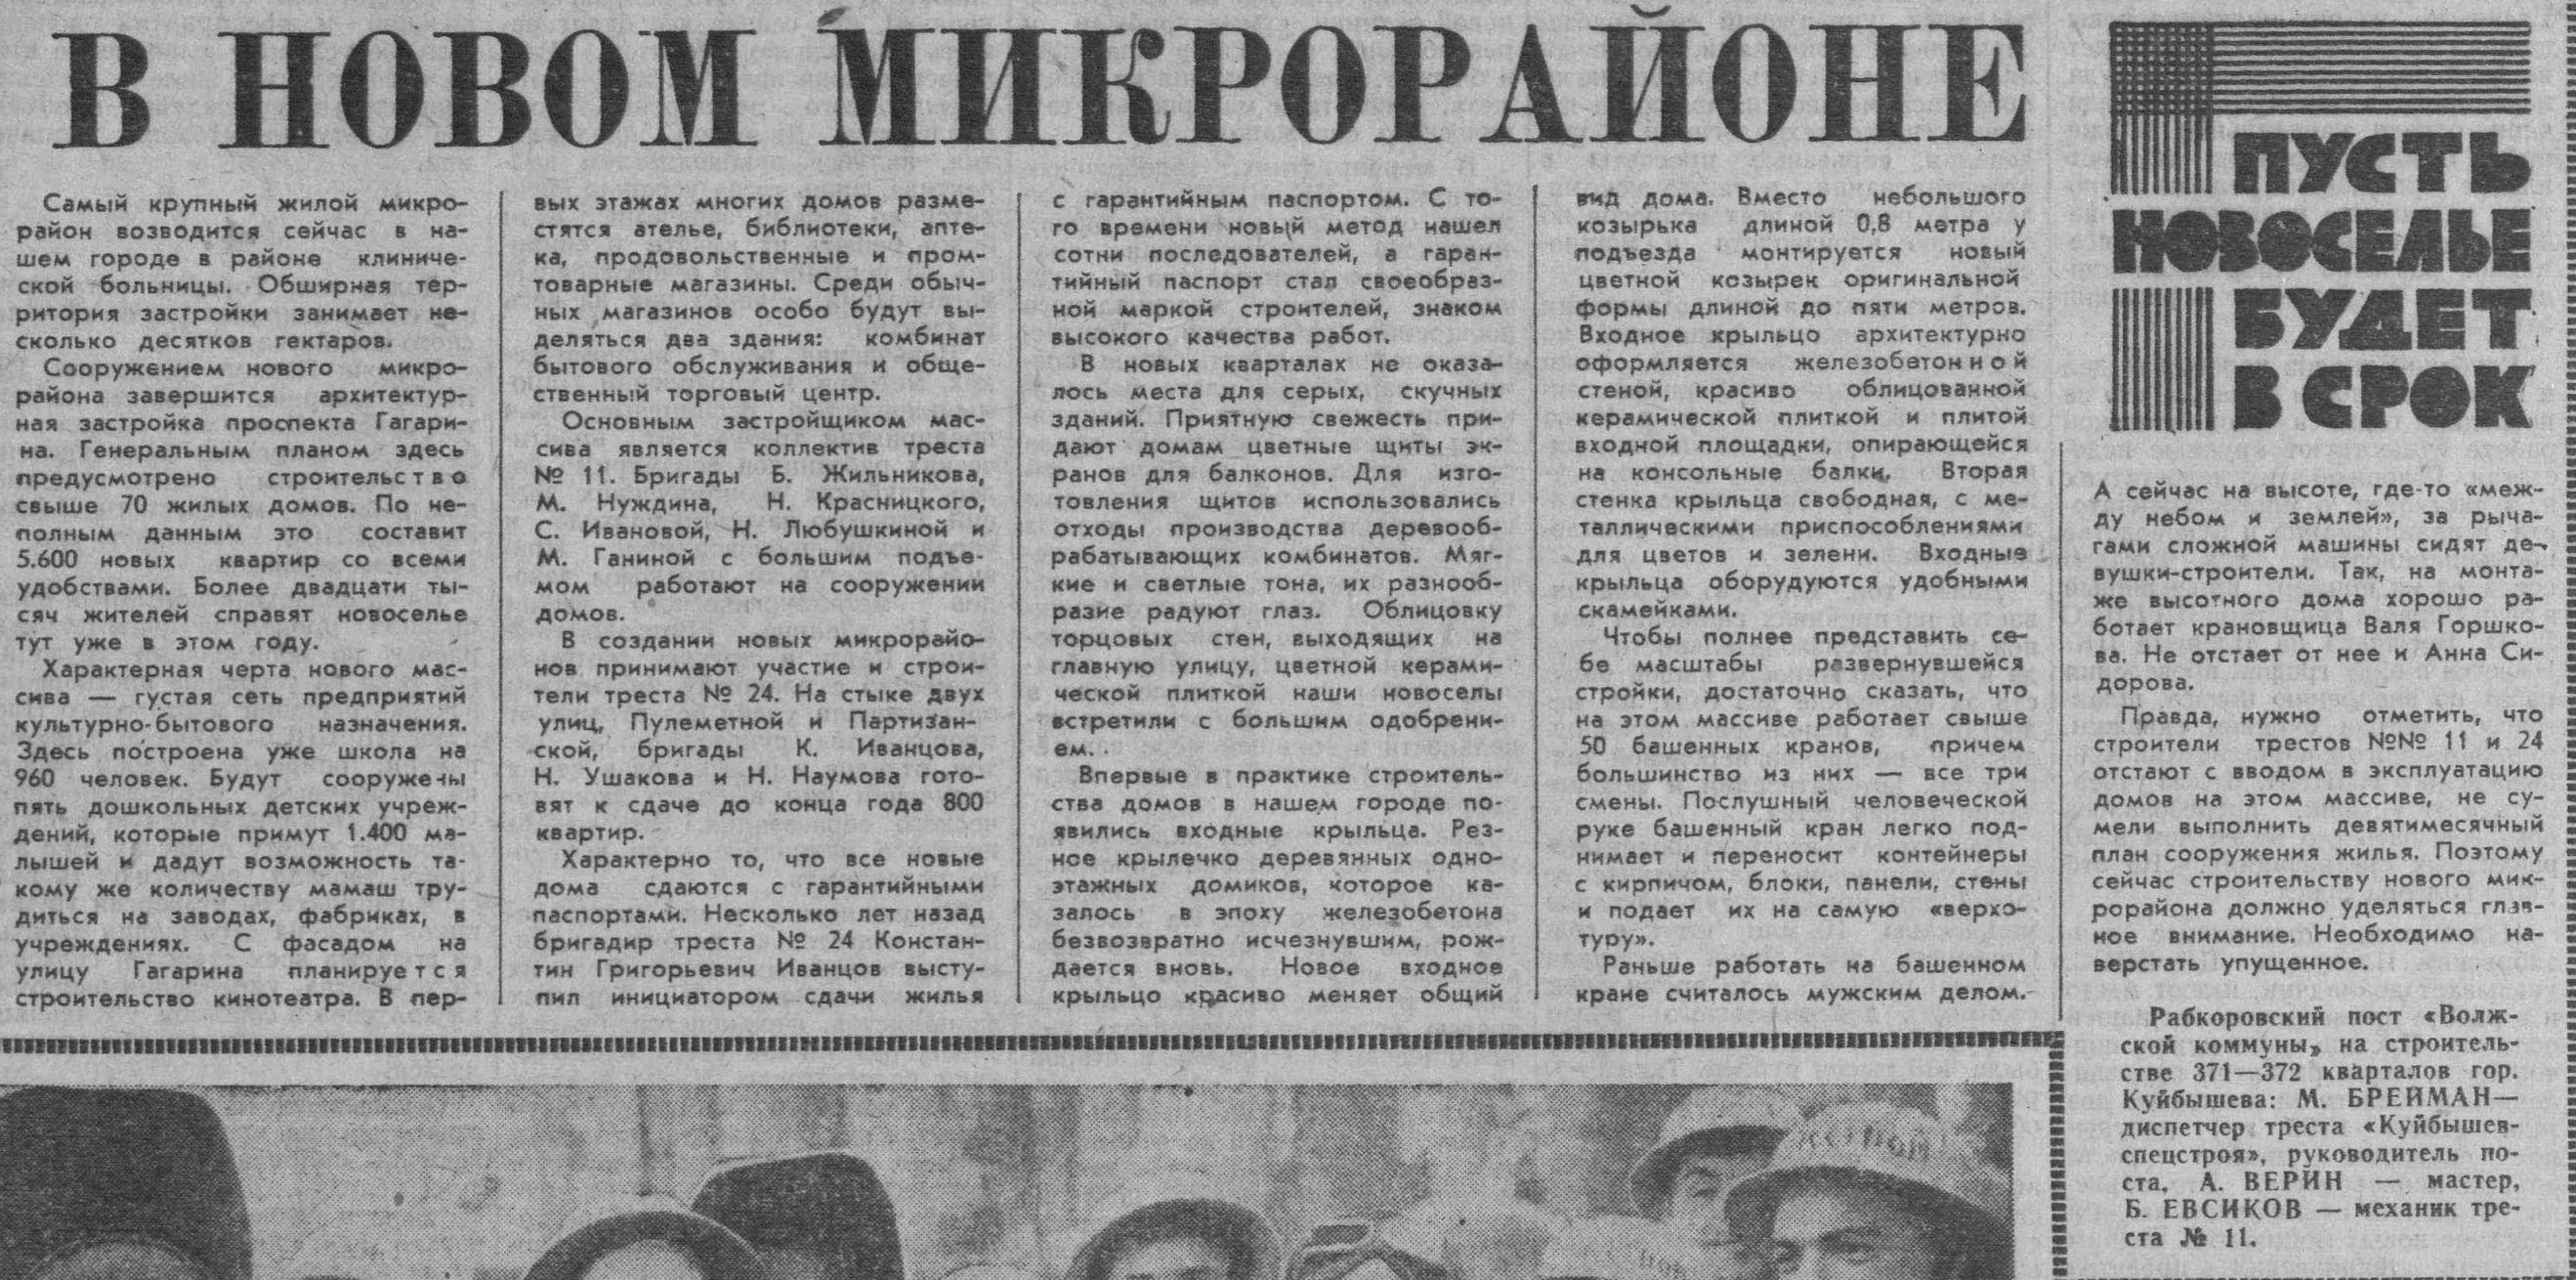 Тухачевского-ФОТО-16-ВКа-1965-10-14-в мкр 371-372-min